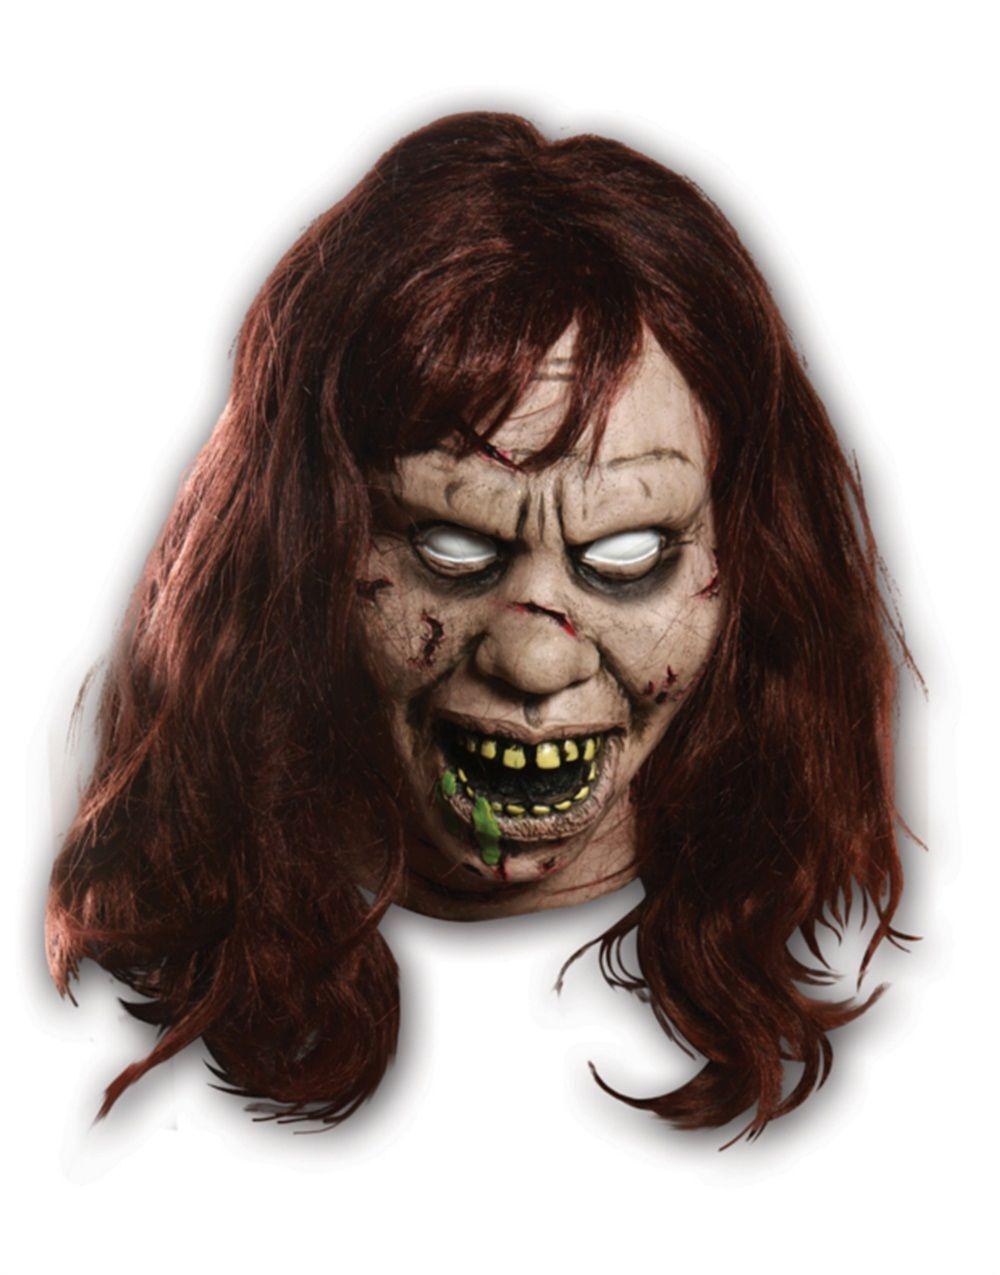 Top 10 Scariest Masks Ever | eBay